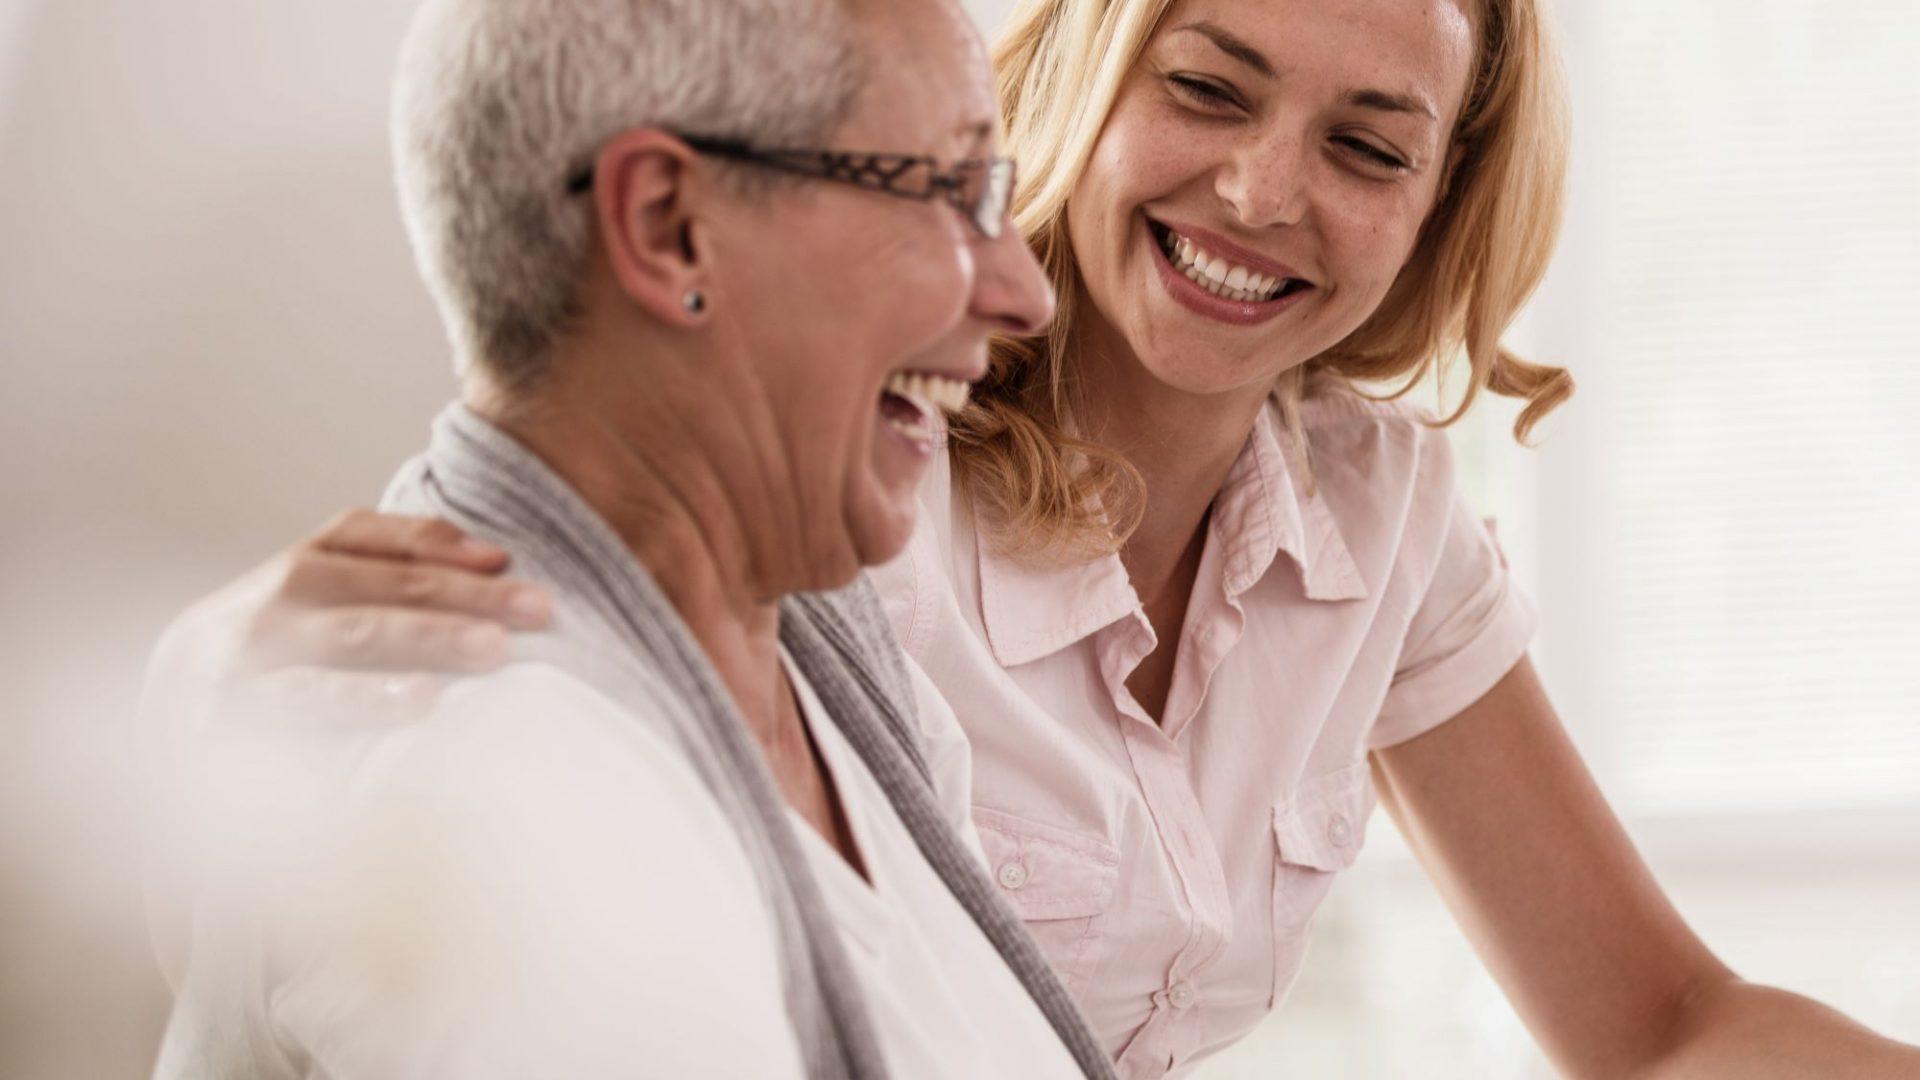 senior care facility administrator